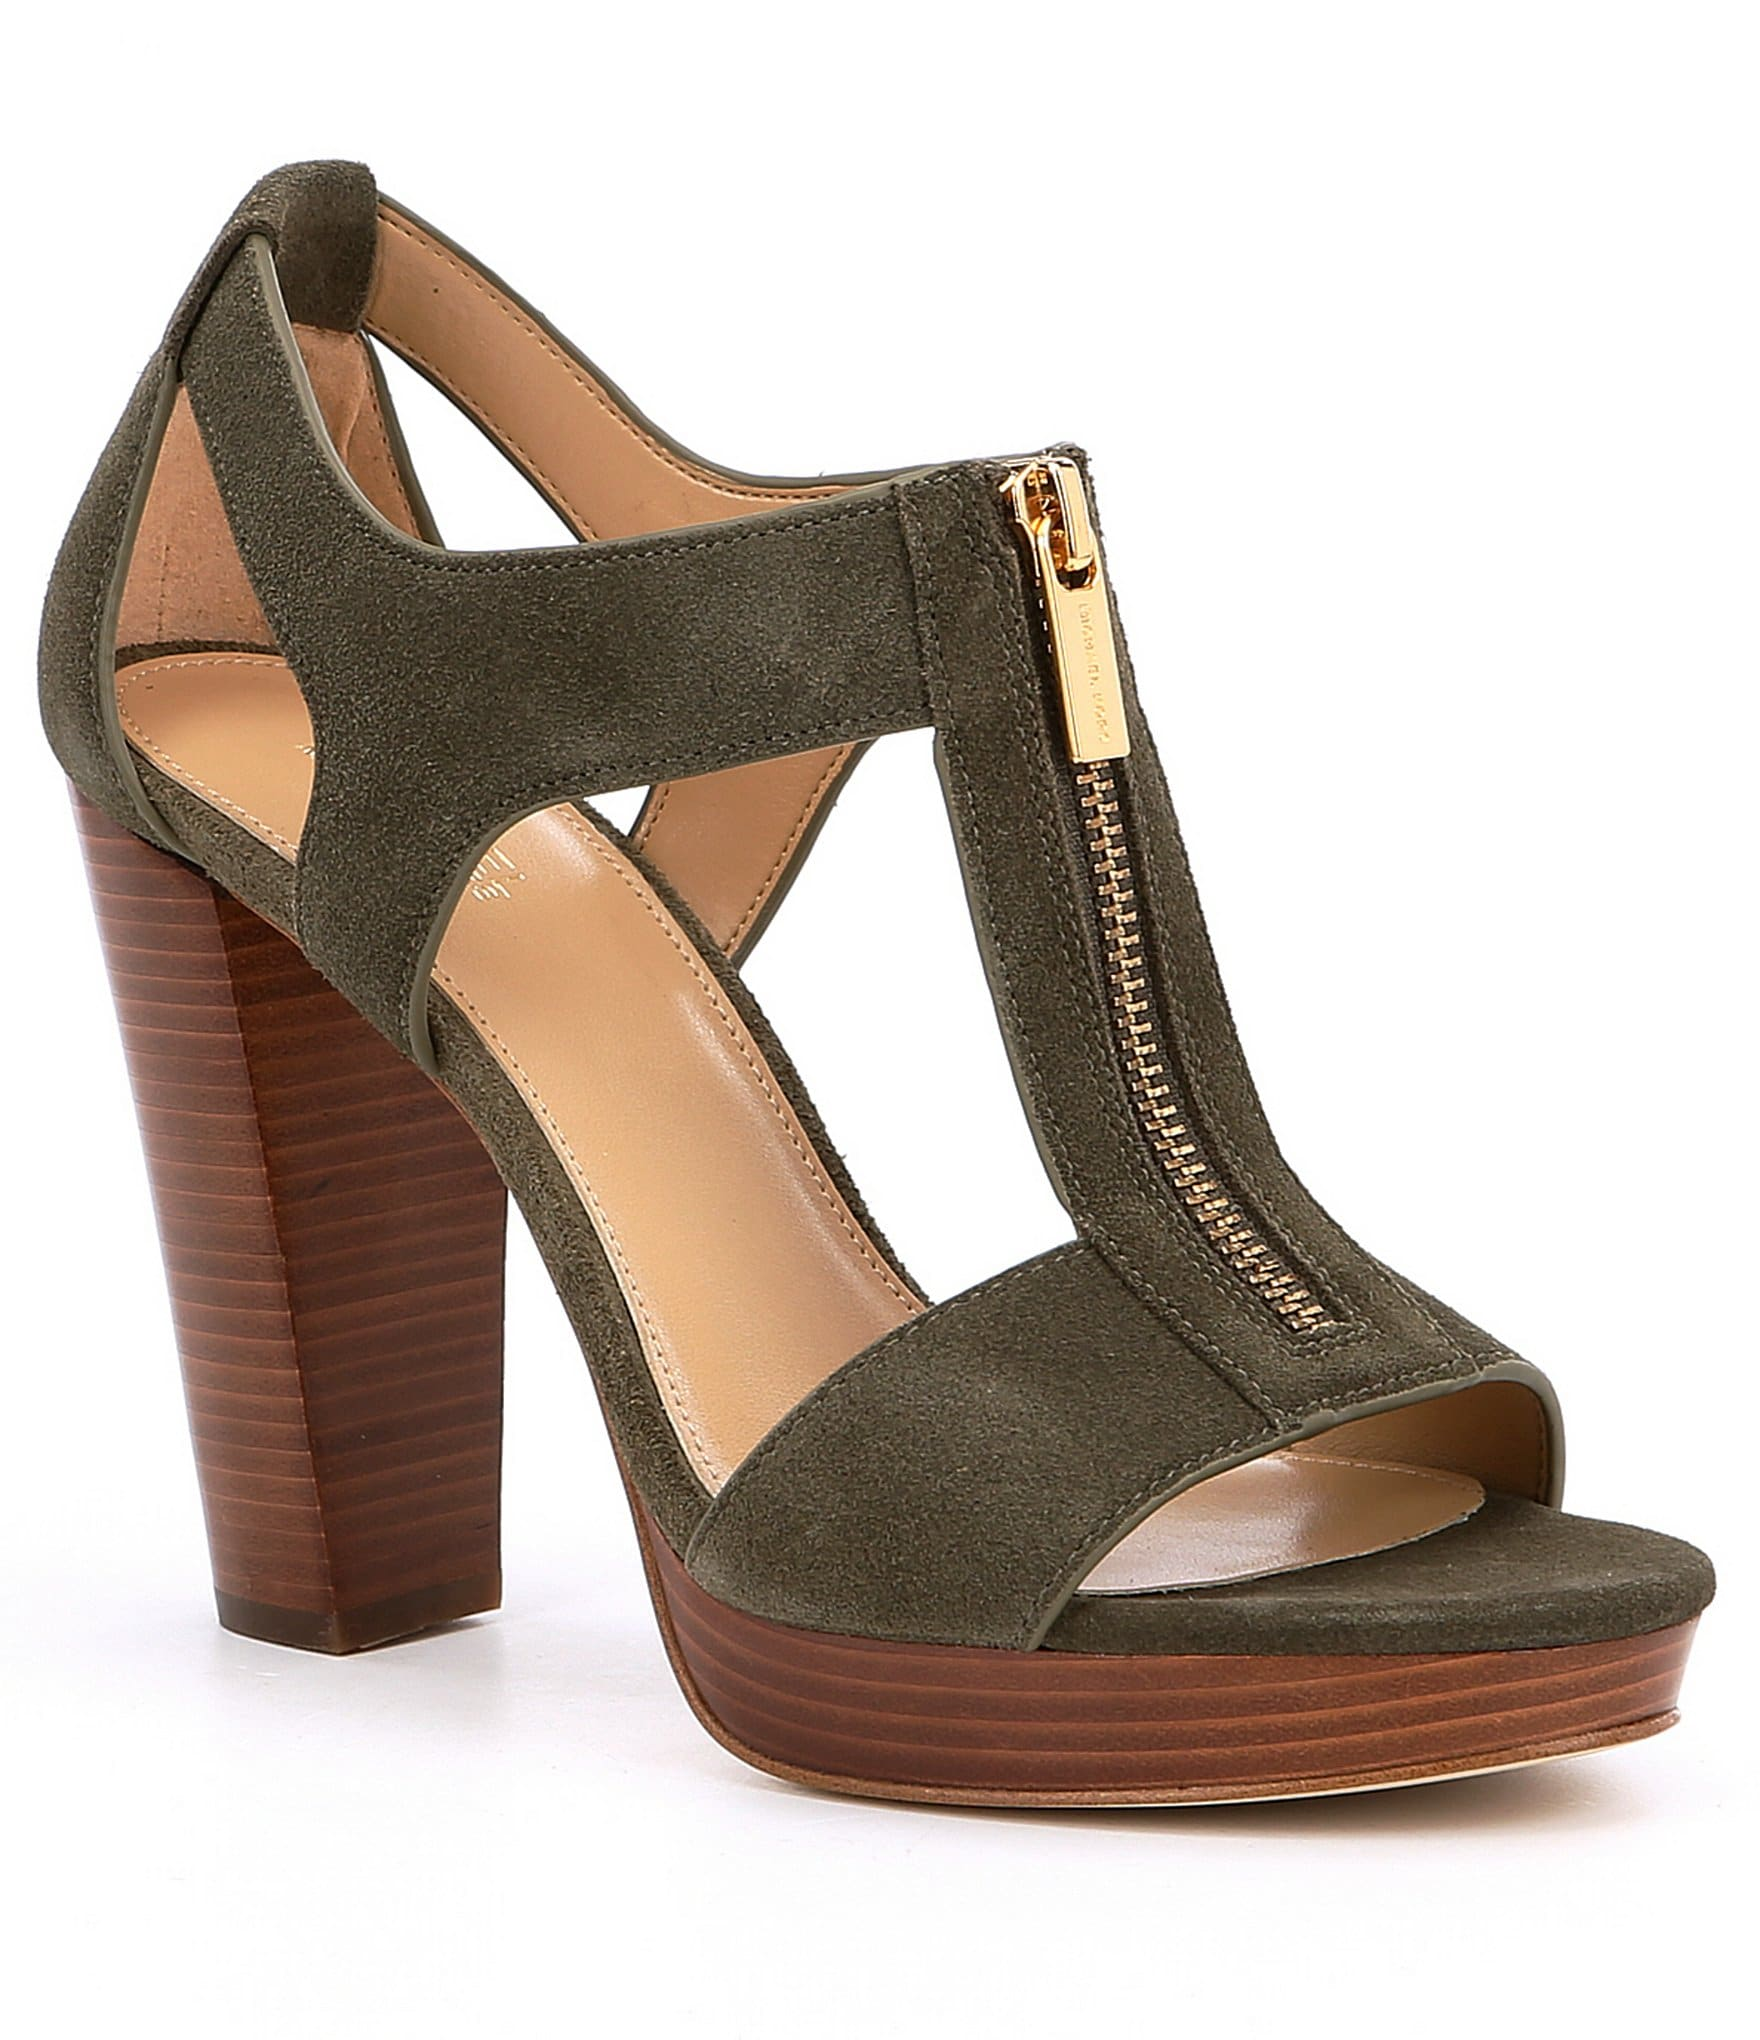 Michael Kors - Abbott sandals - sandals - 40S9ABFA1L203